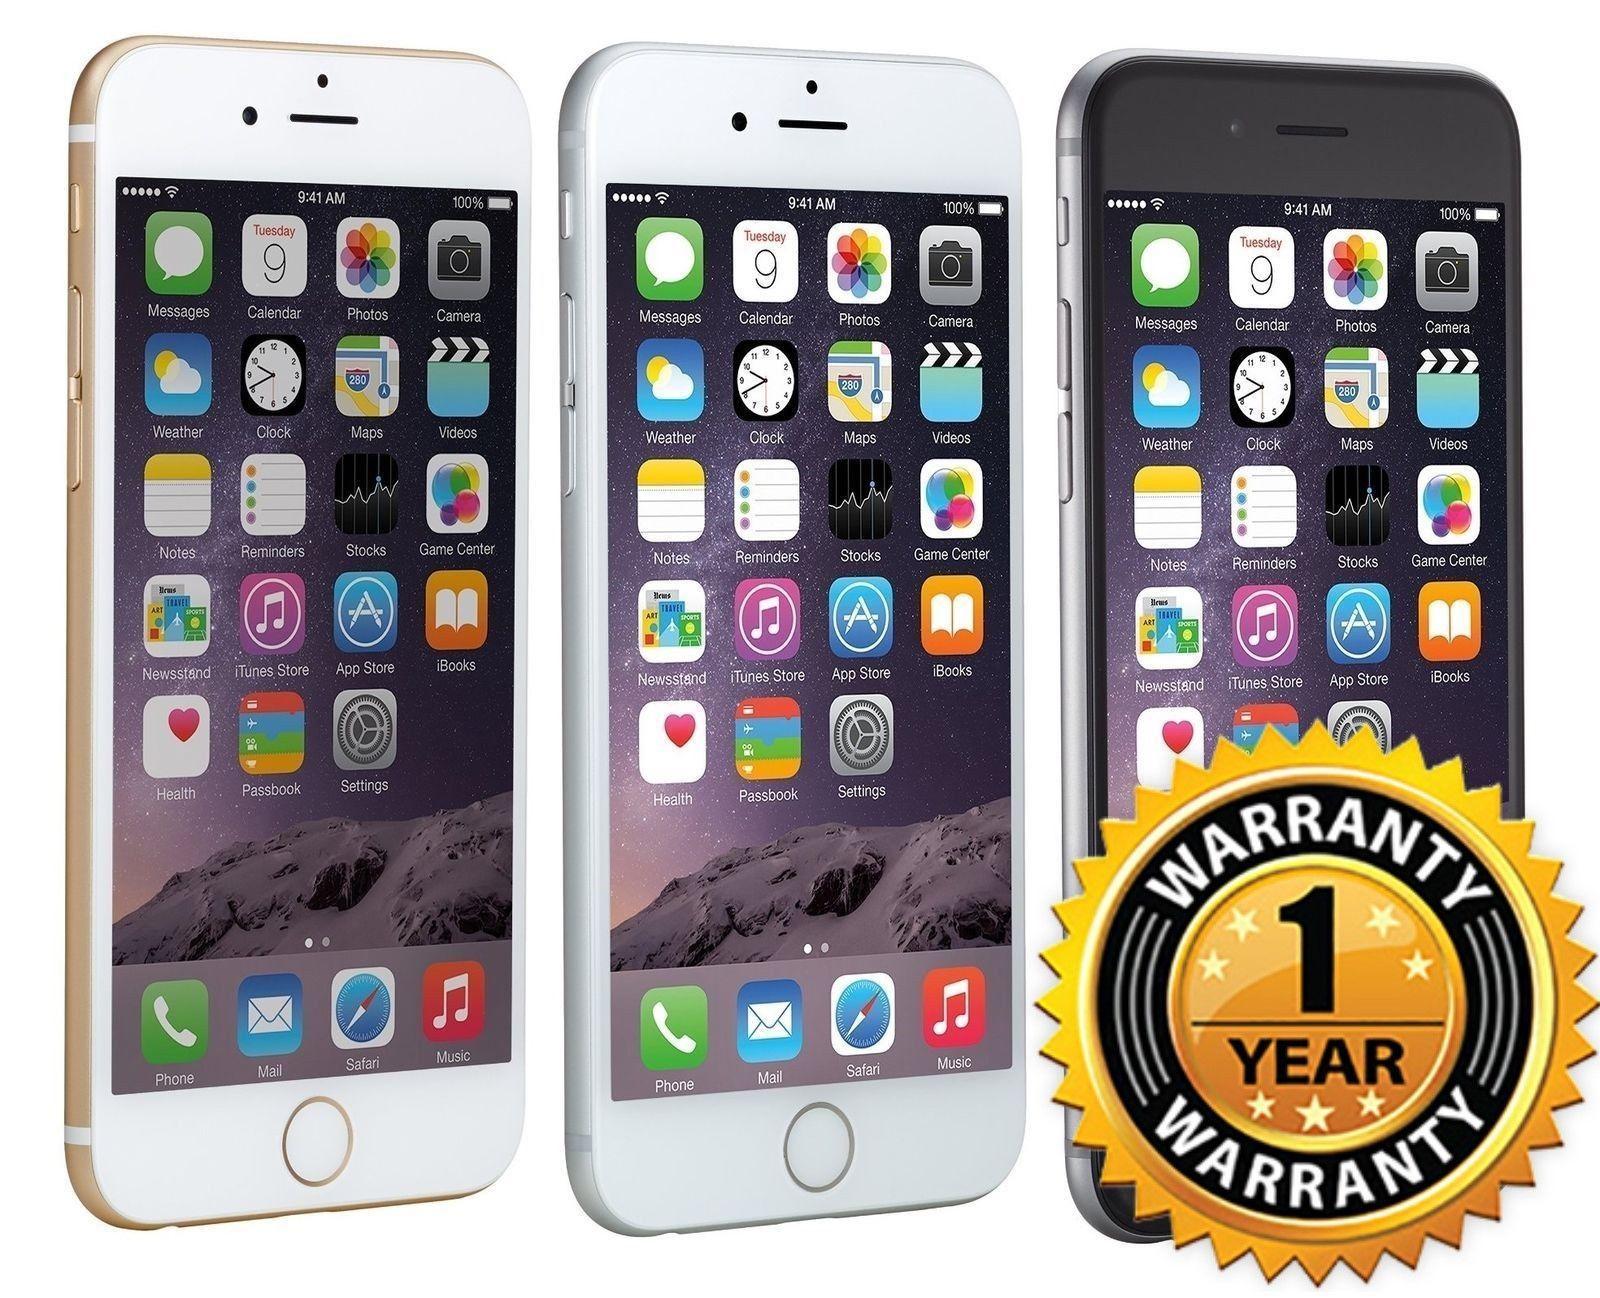 139 99 Apple Iphone 6 16gb Gsm Unlocked 4 7 Display Smartphone 1 Year Warranty Apple Iphone 16gb Unlocke Apple Iphone 6 Iphone 6 16gb Apple Iphone